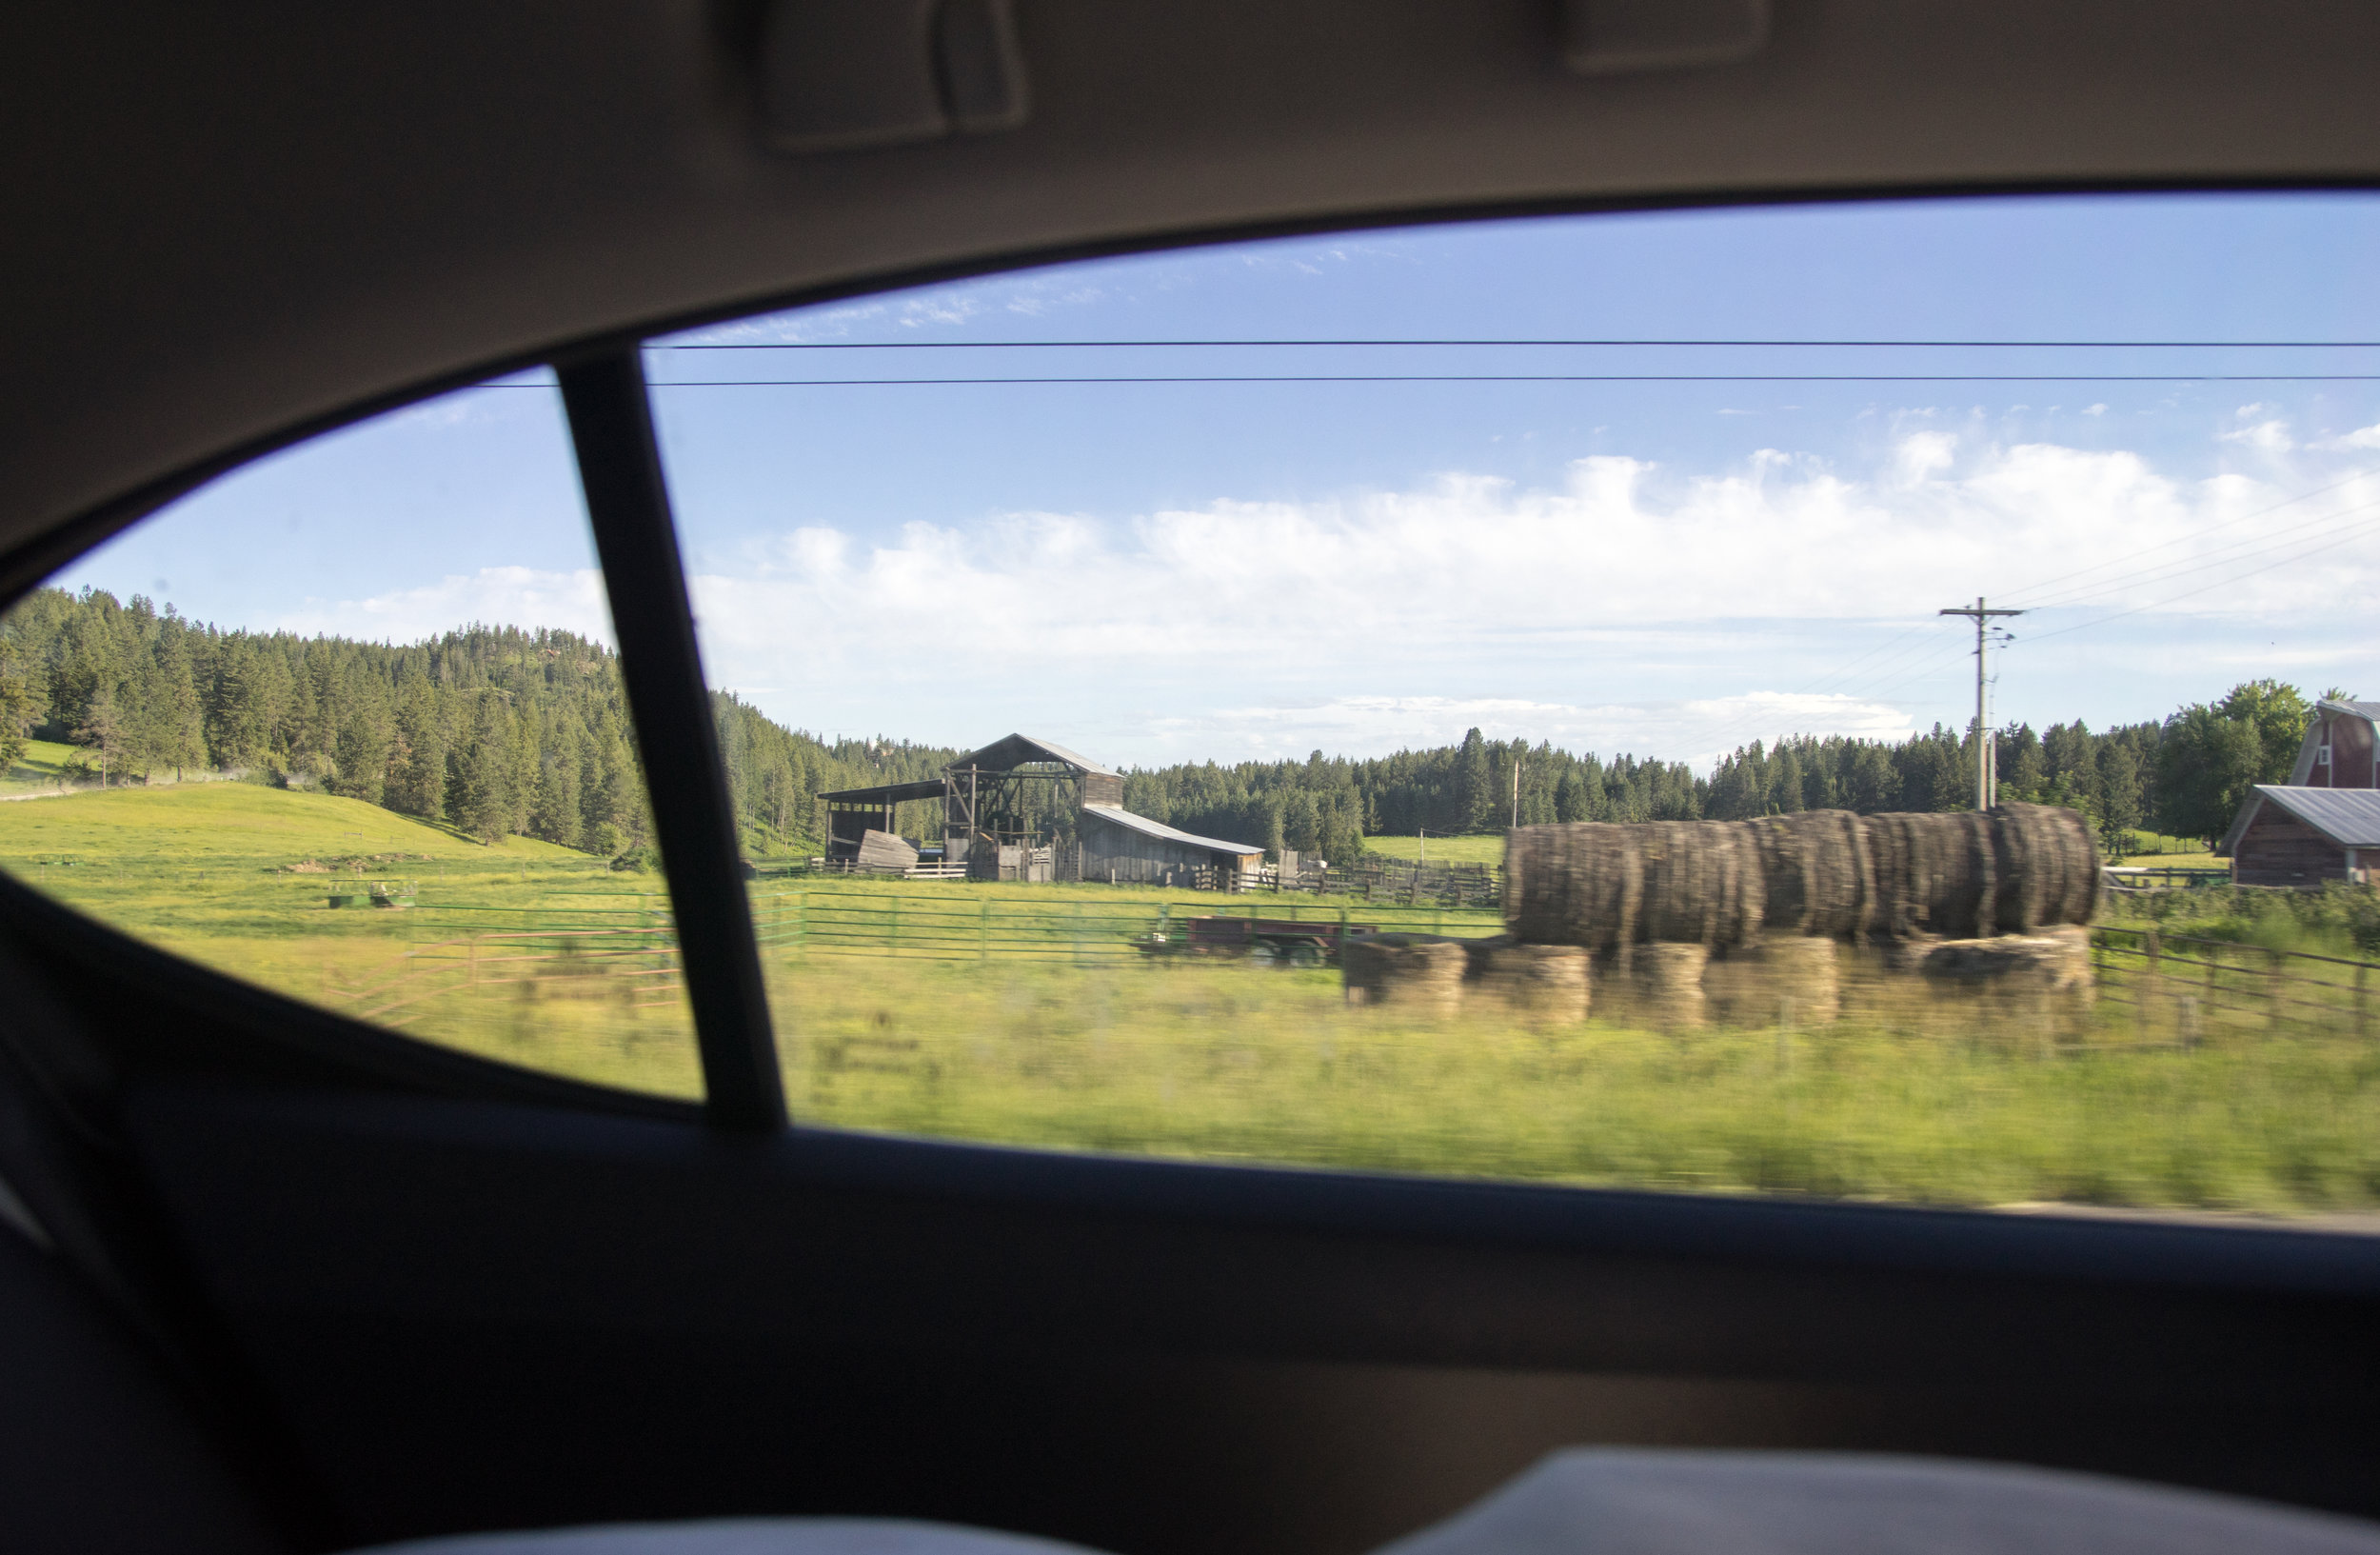 American West - Northern Idaho, ID